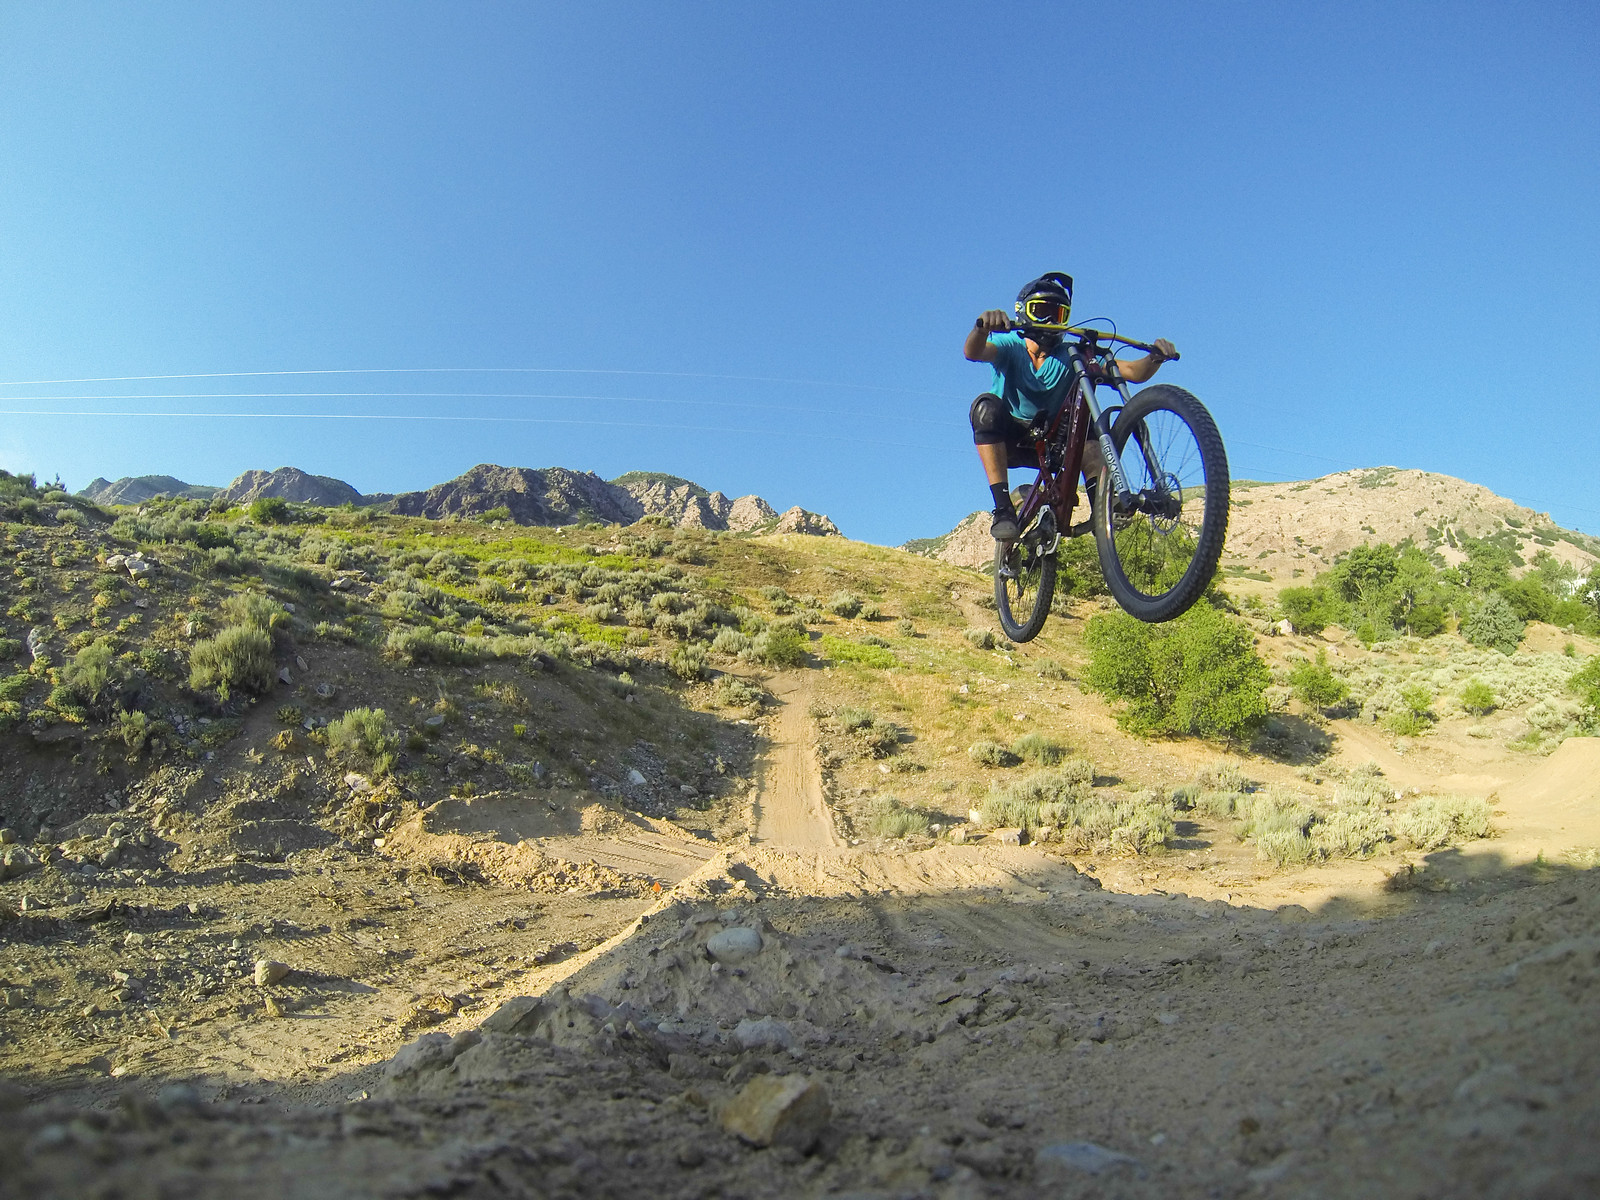 G0020111 edited - slayersxc - Mountain Biking Pictures - Vital MTB